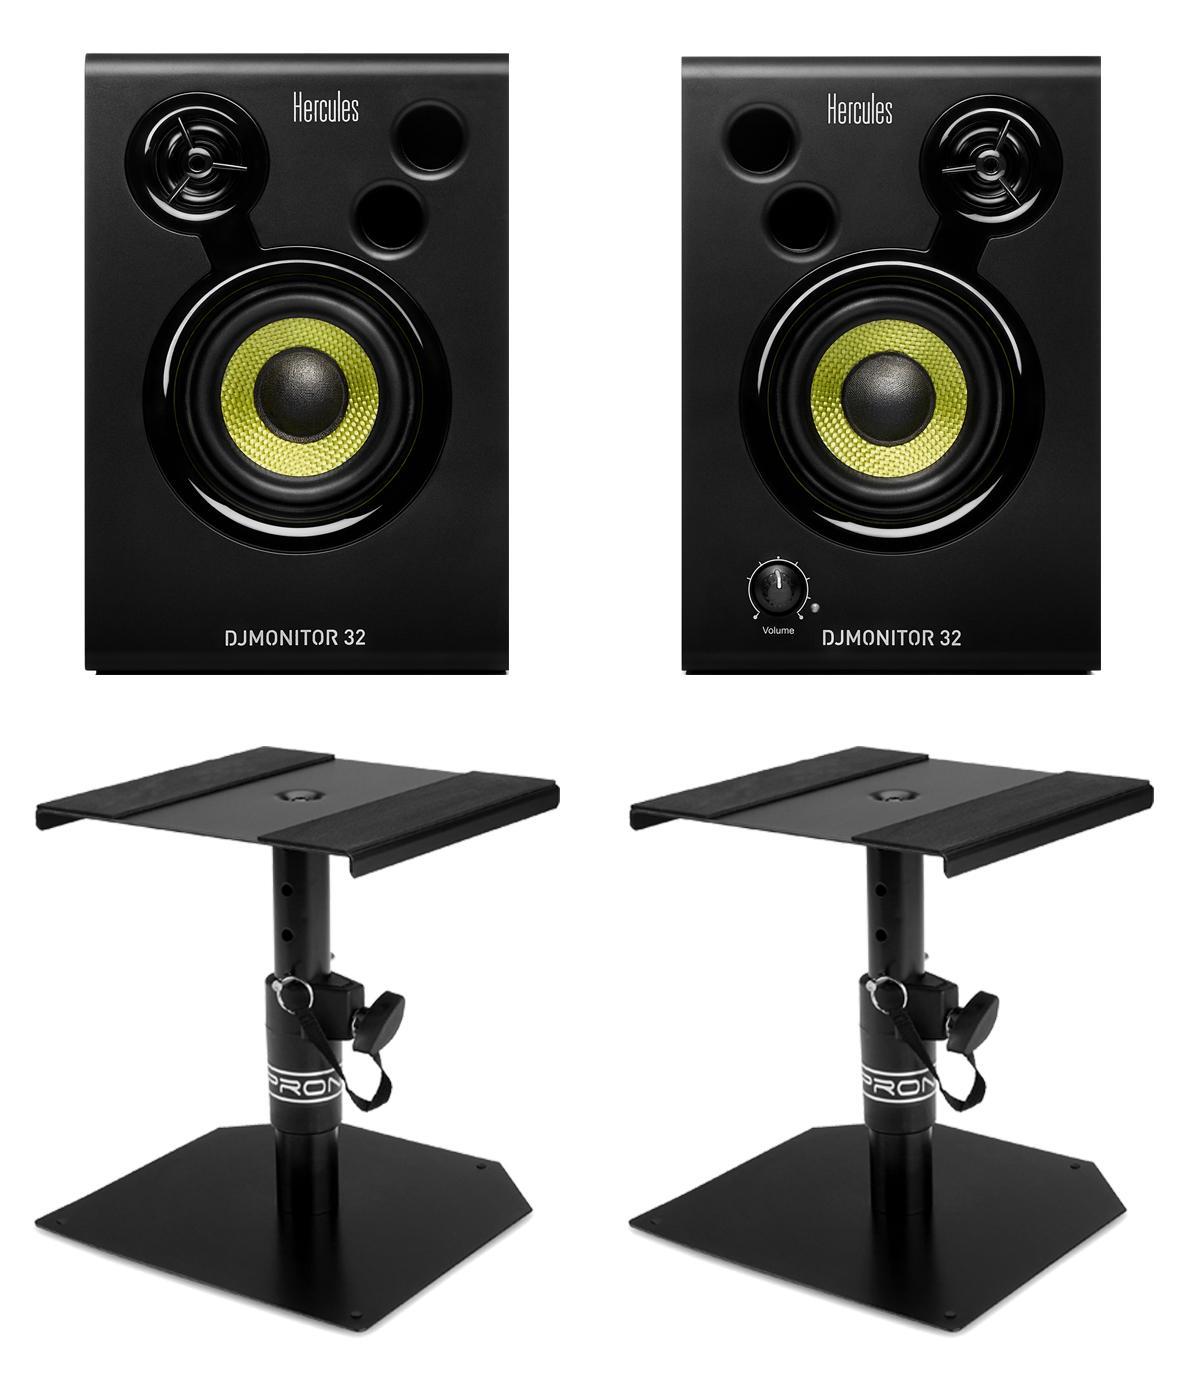 Studiomonitore - Hercules DJMonitor 32 Tischstativ Set - Onlineshop Musikhaus Kirstein